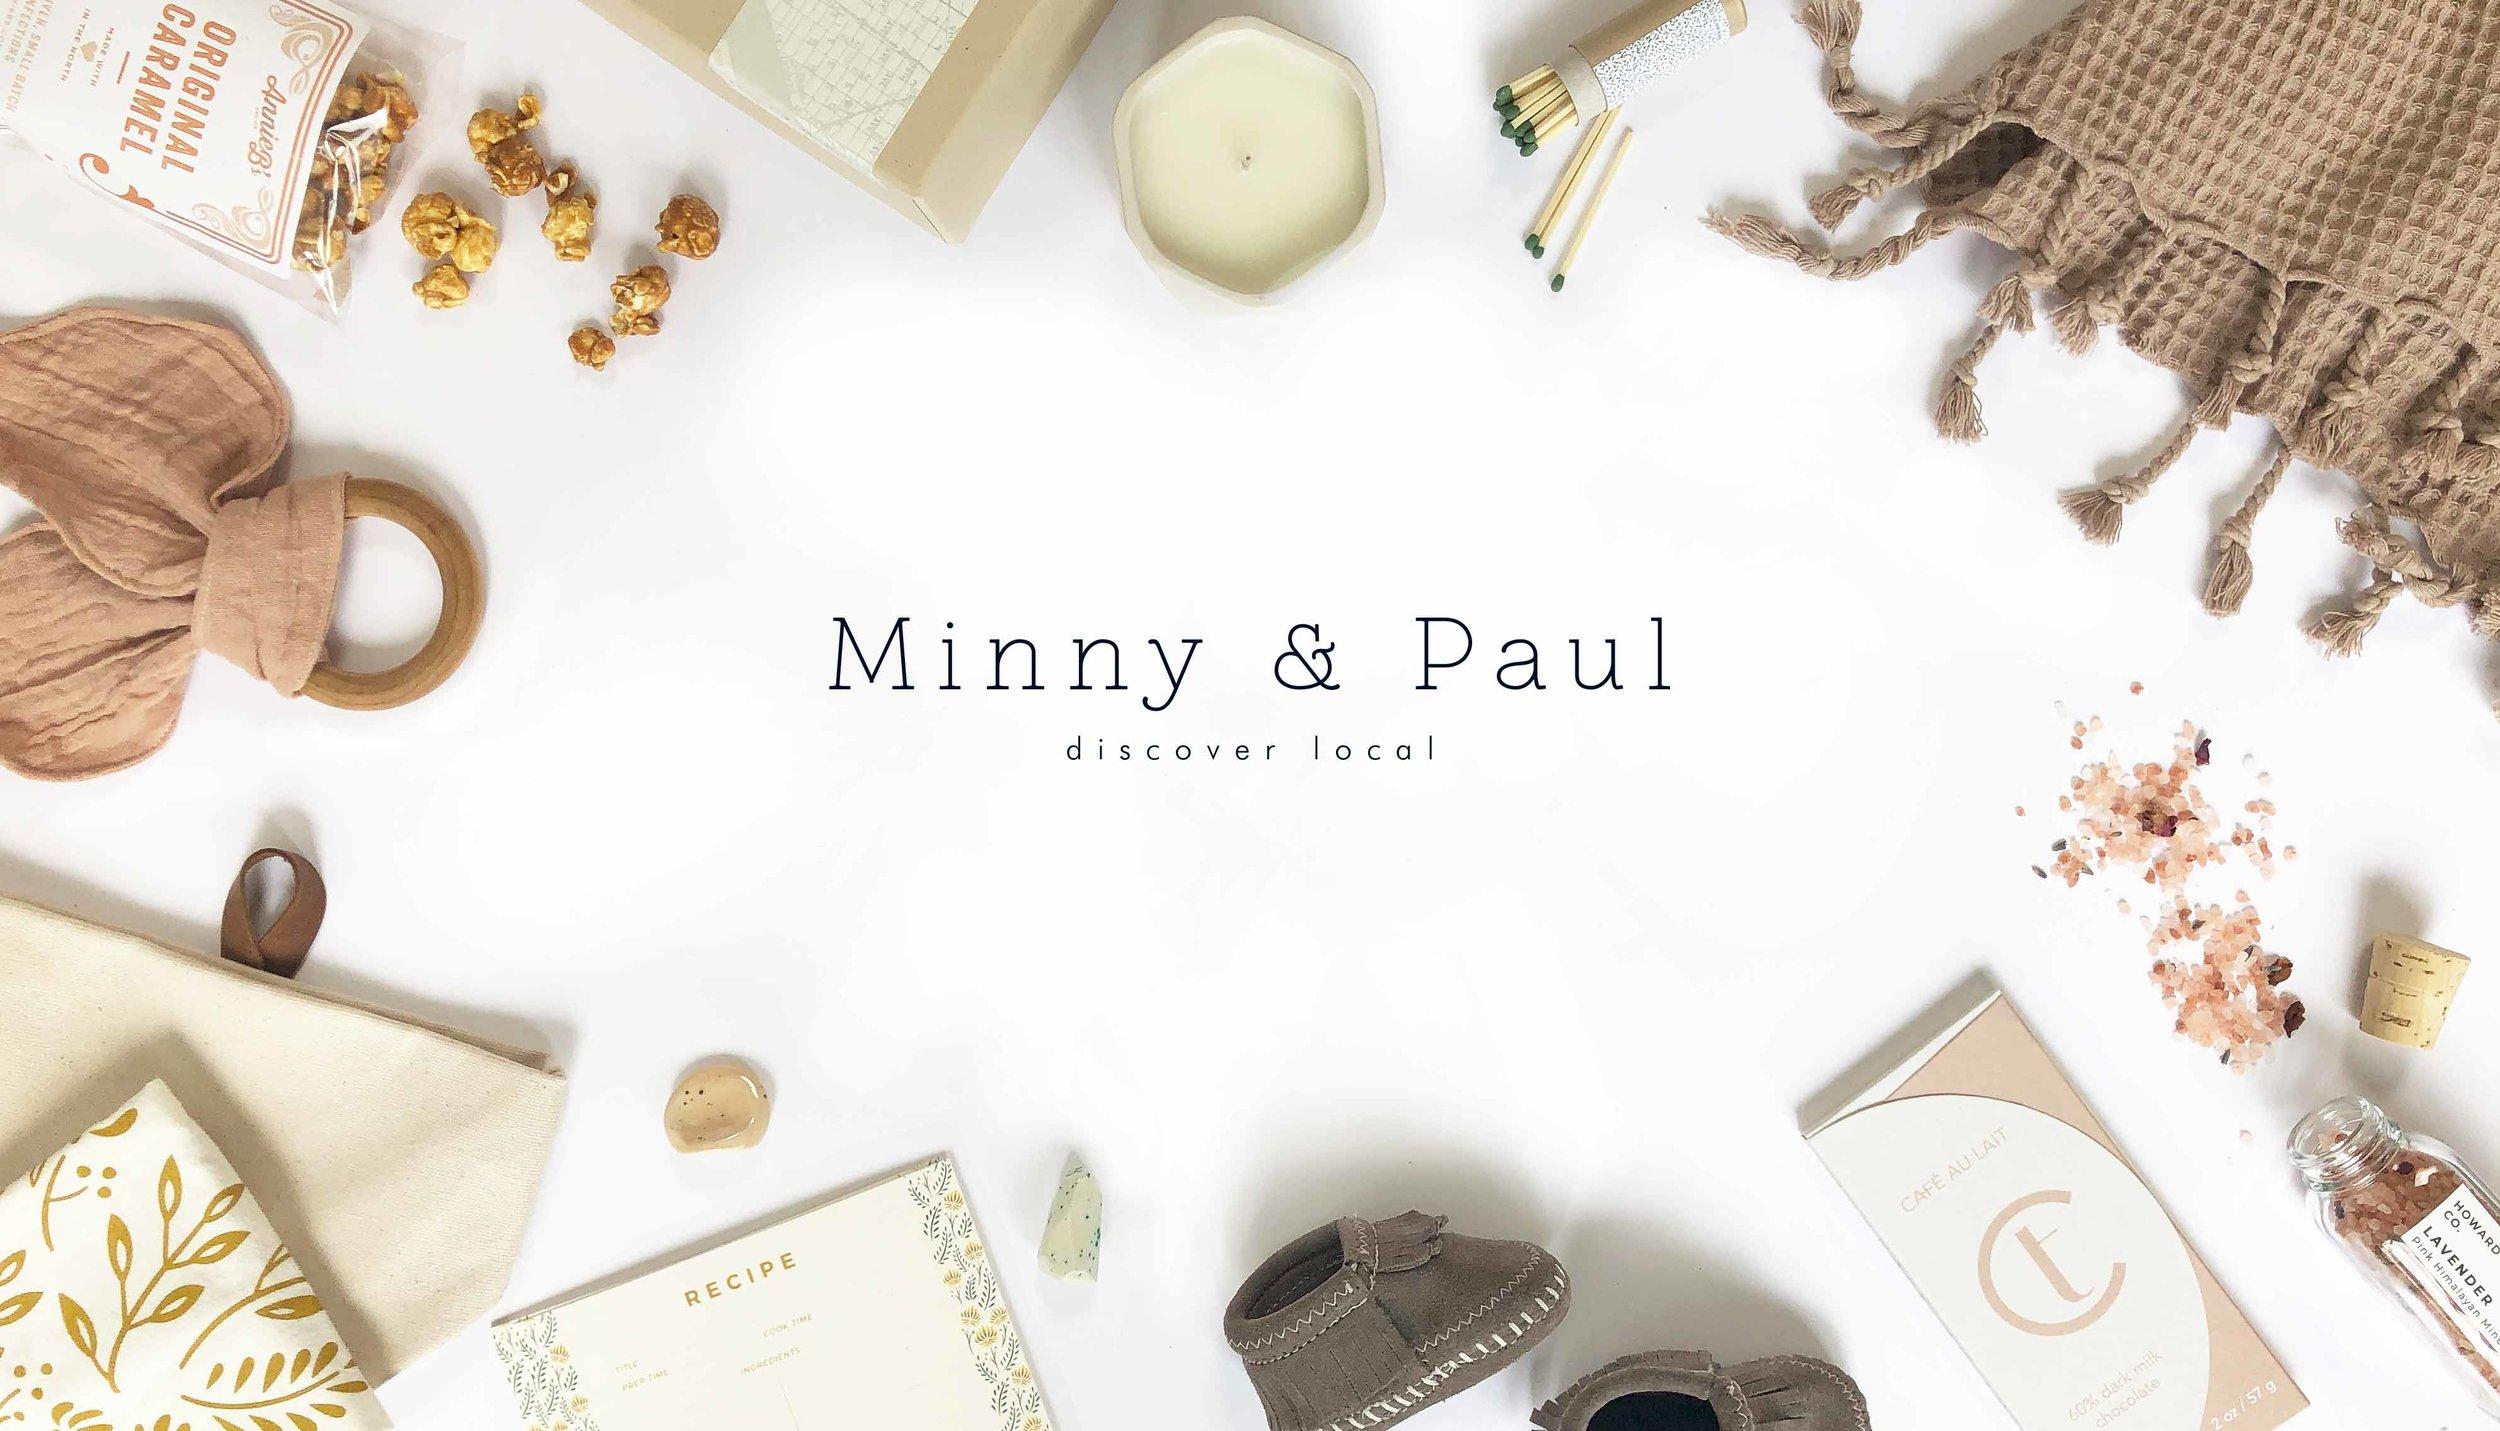 minnypaul-banner-web.jpg